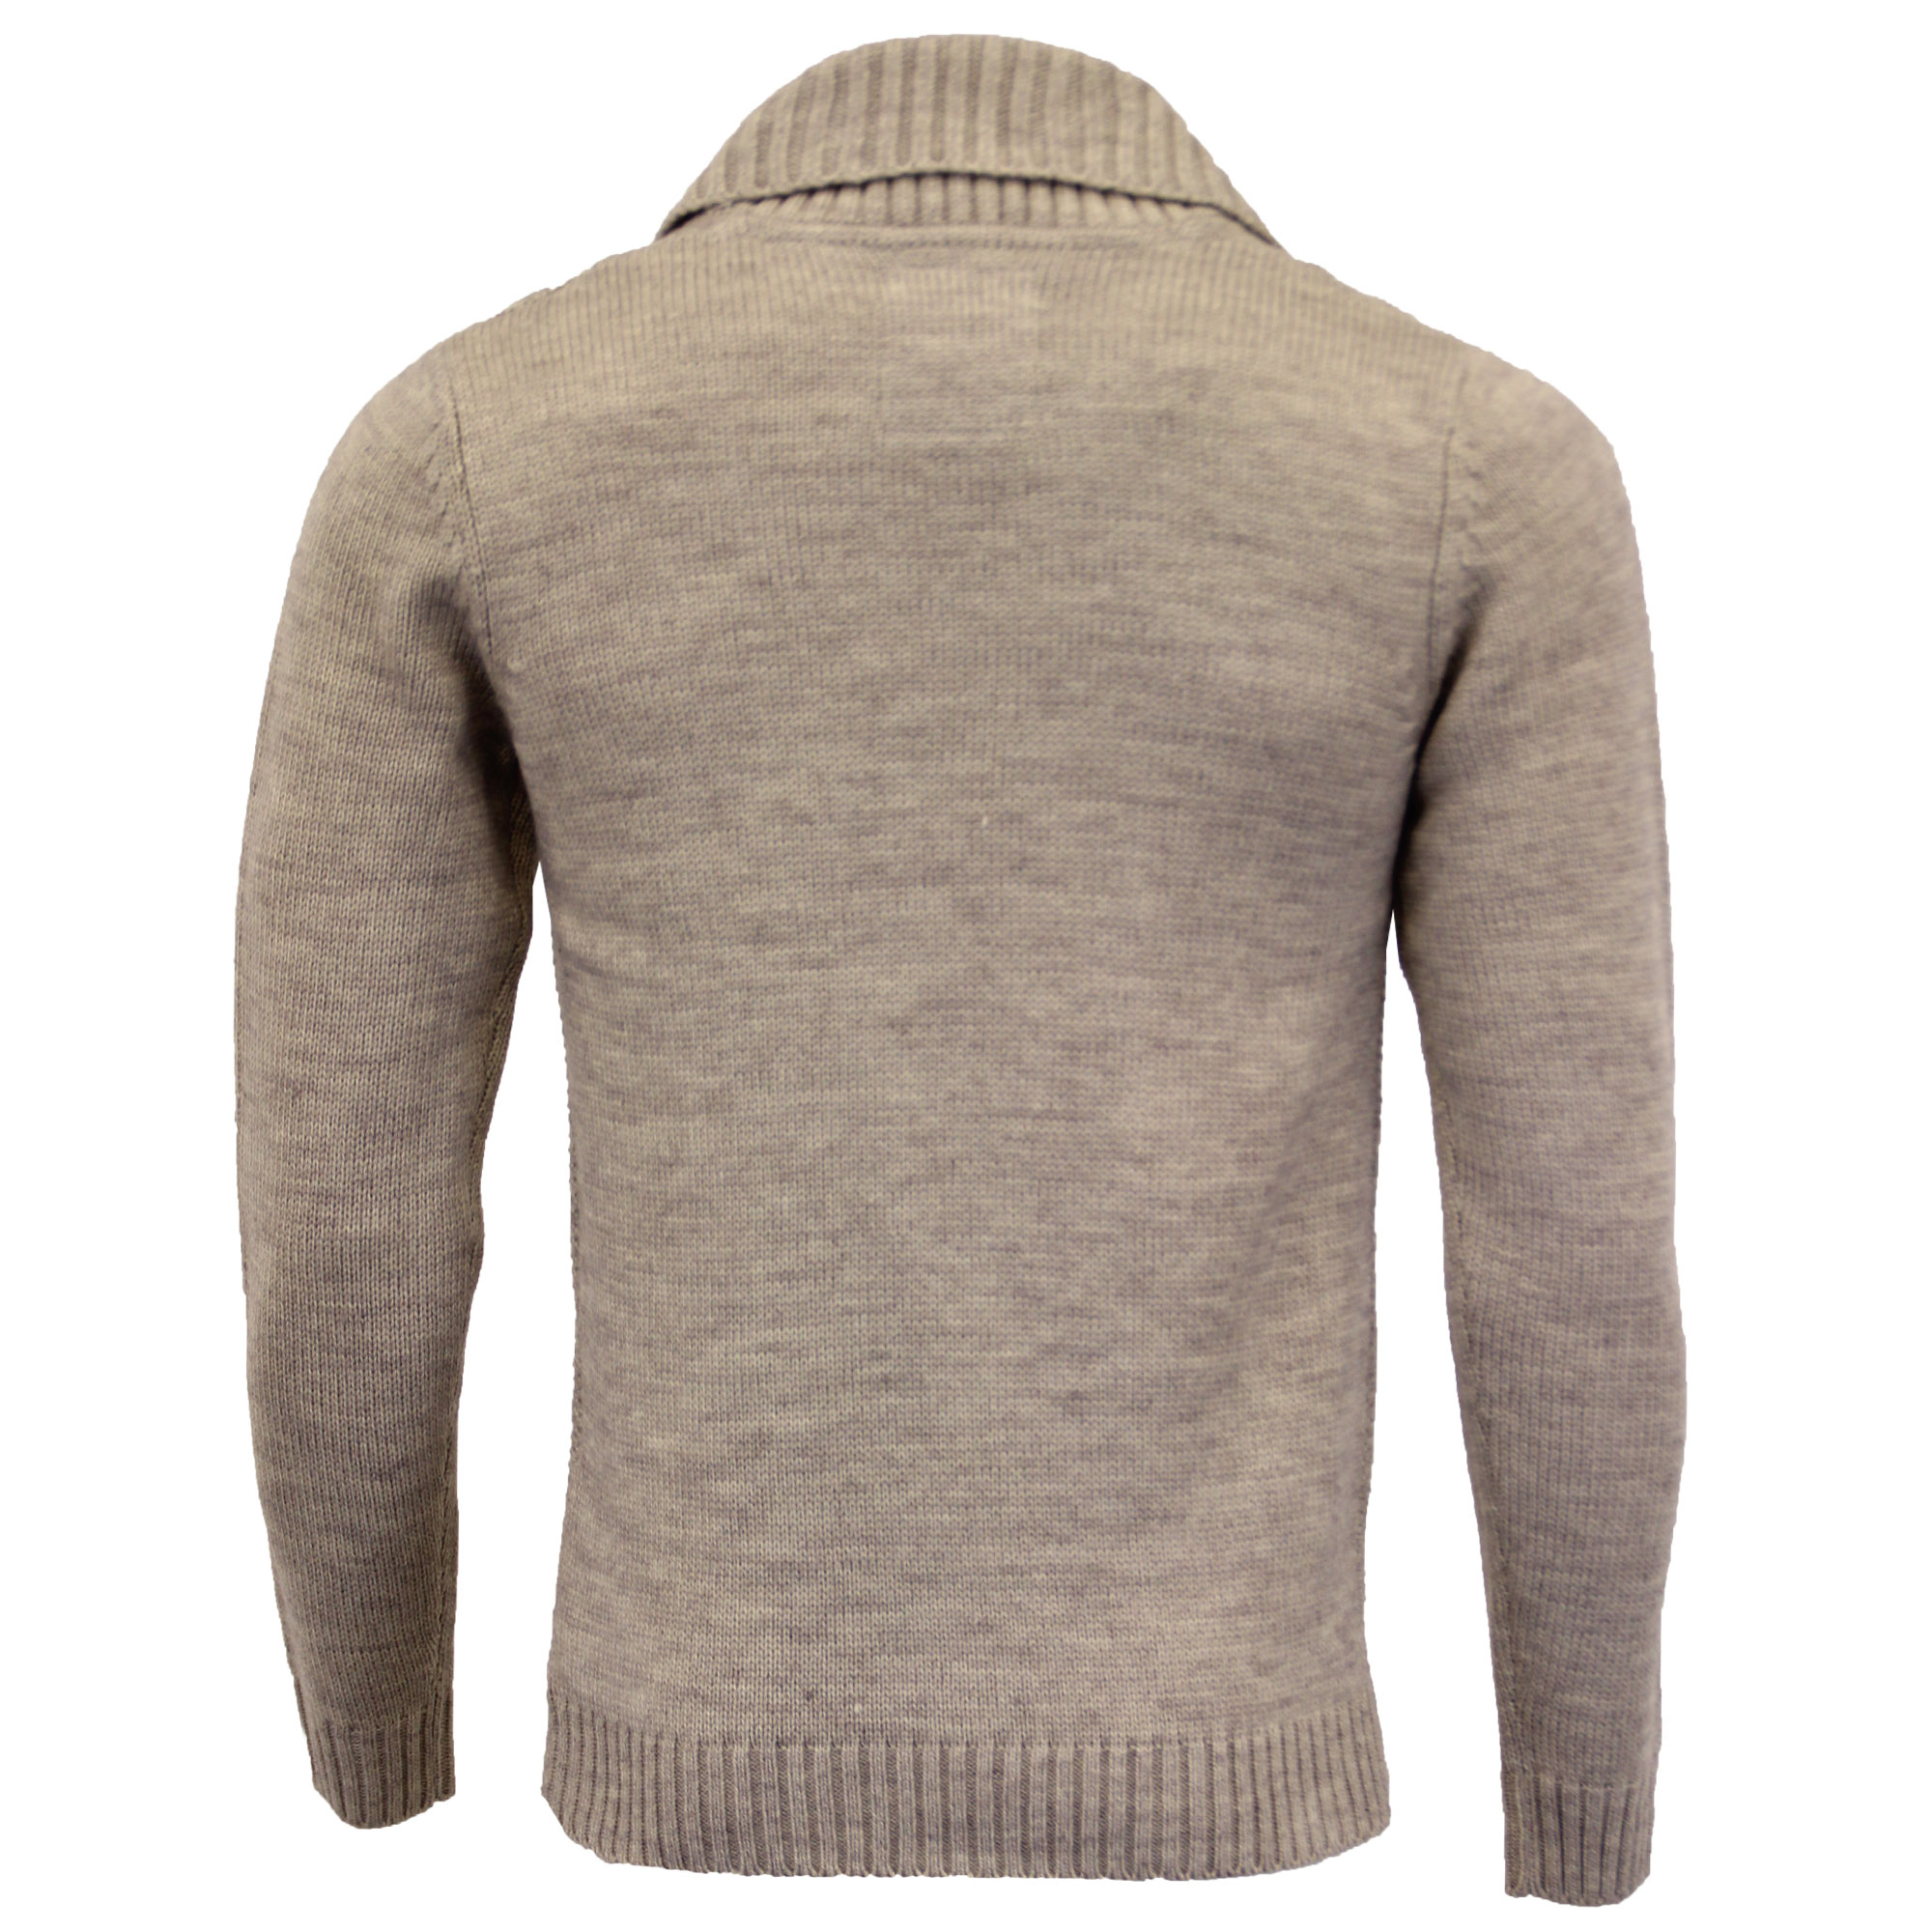 Mens-Wool-Mix-Cardigans-Threadbare-Knitted-Sweater-Broken-Standard-Shawl-Winter thumbnail 24